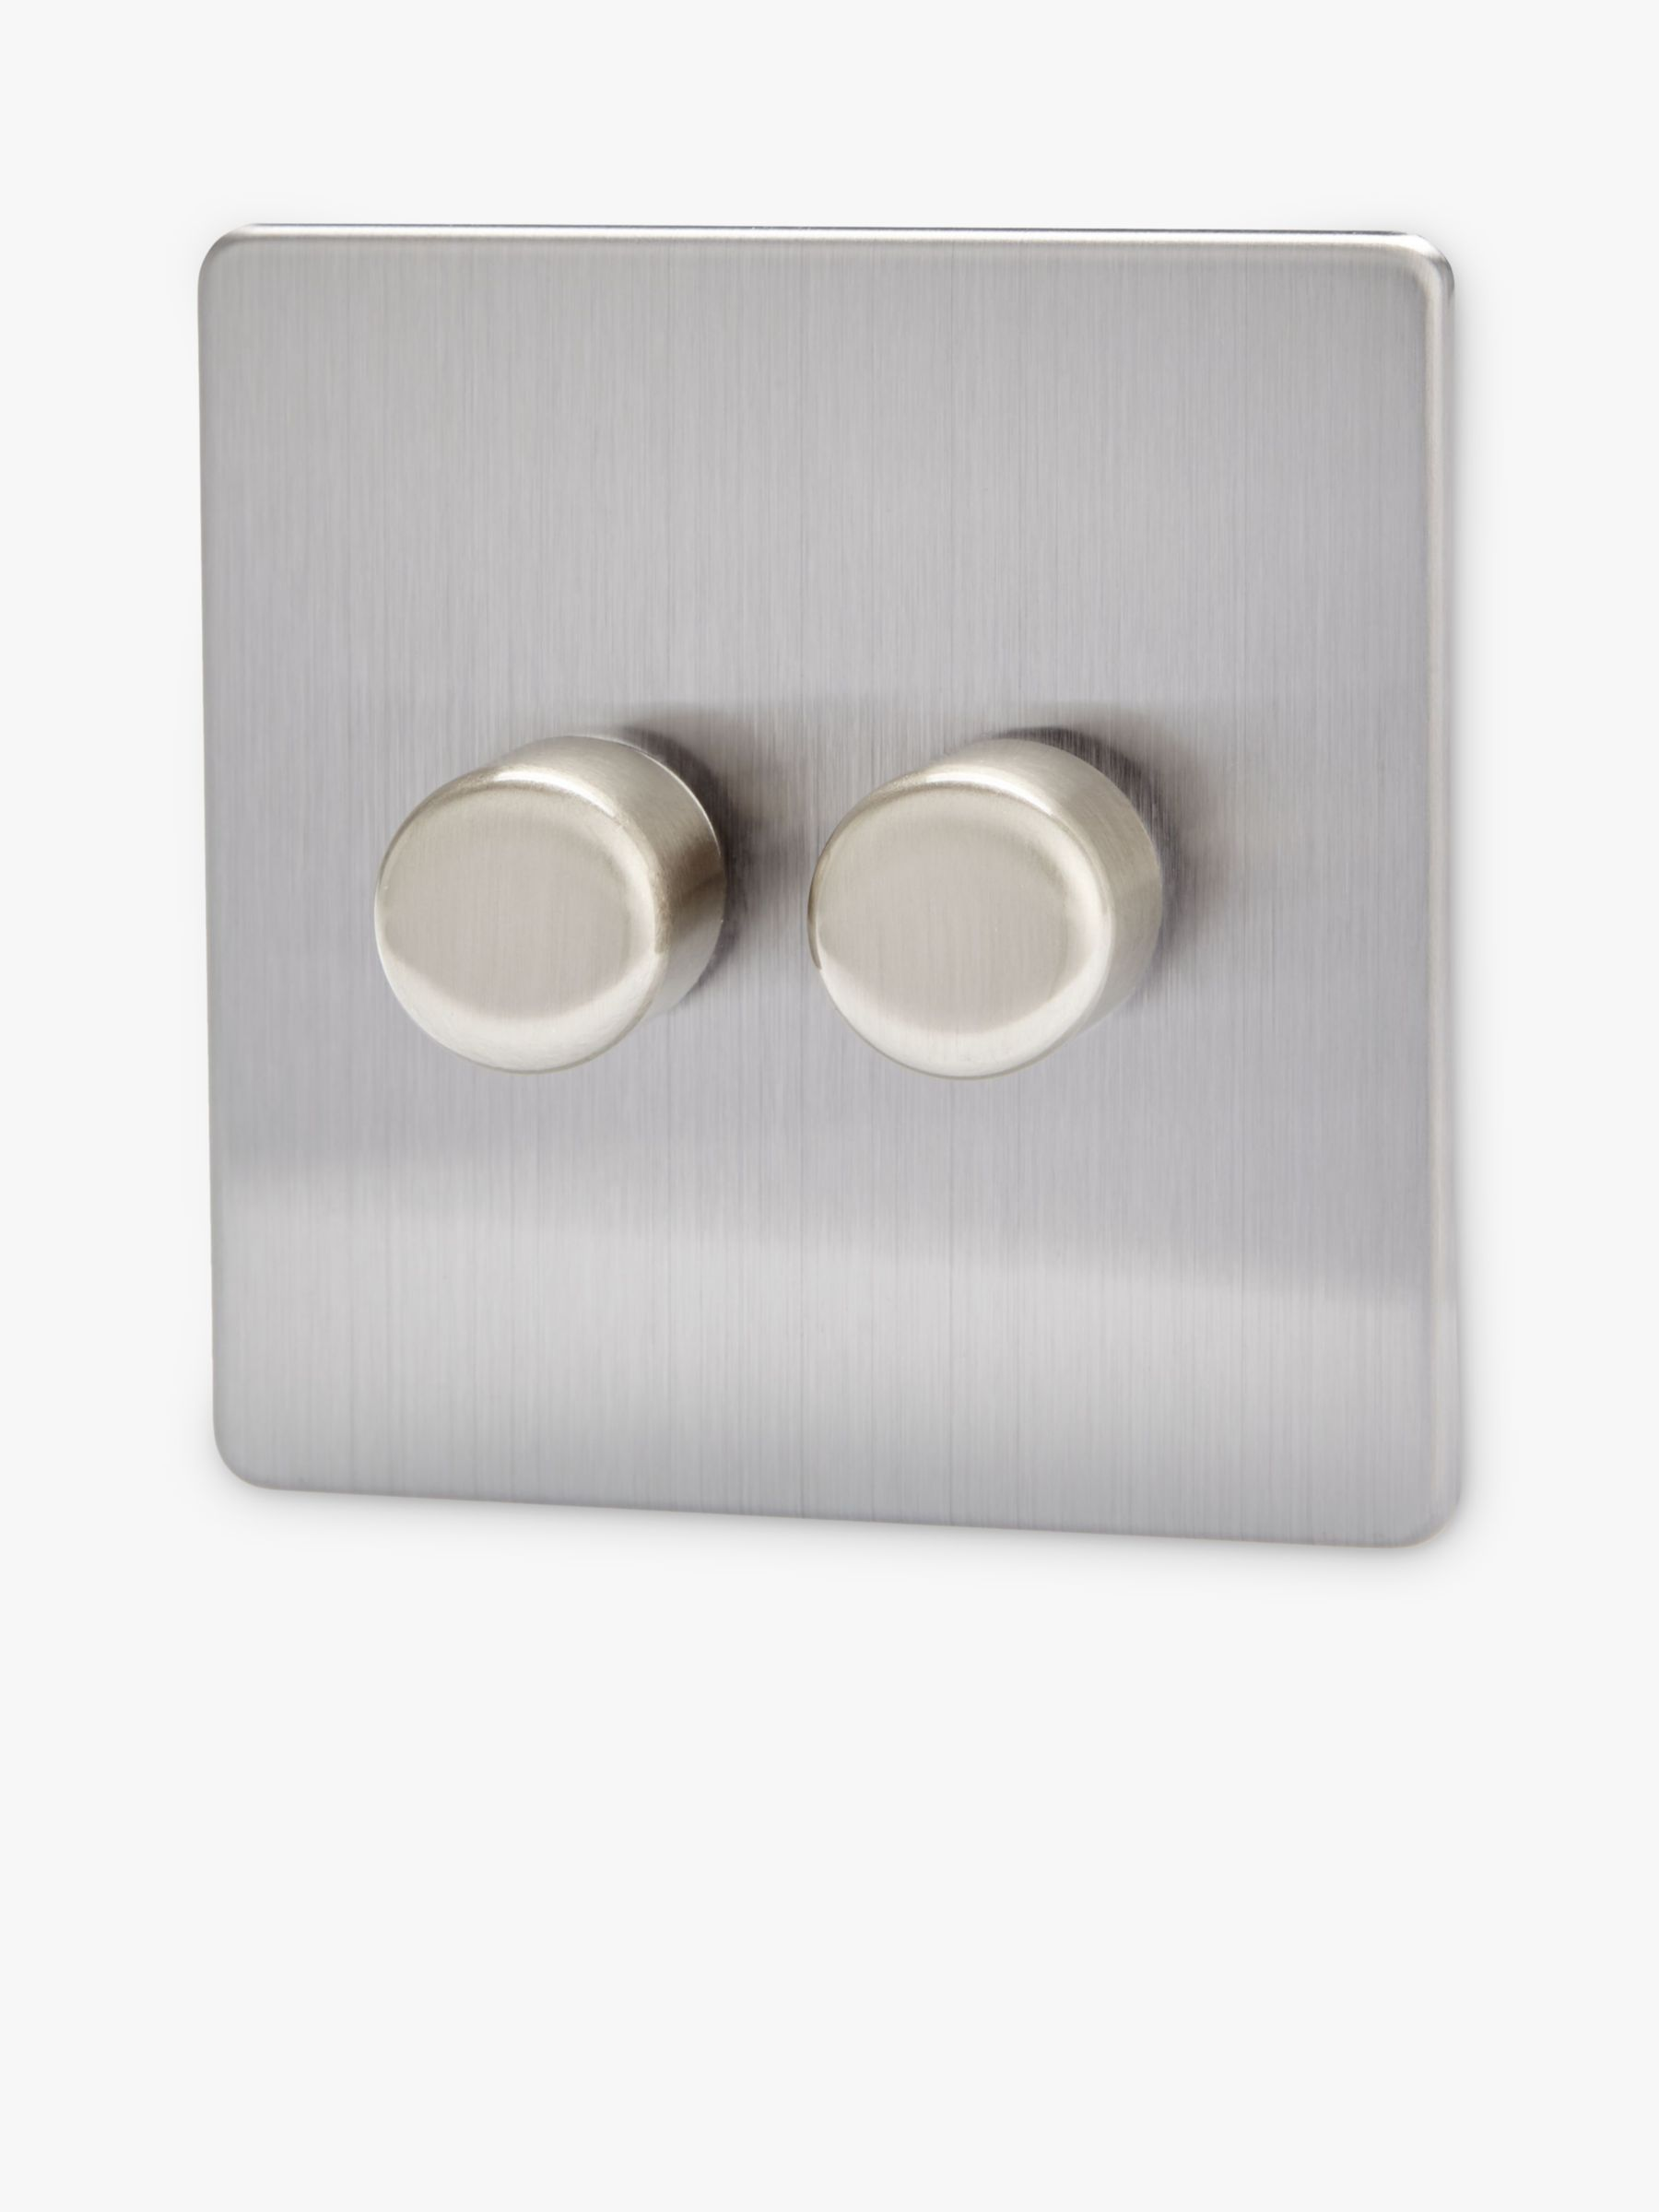 Varilight Varilight 2 Gang V-Pro LED Rotary Dimmer Switch